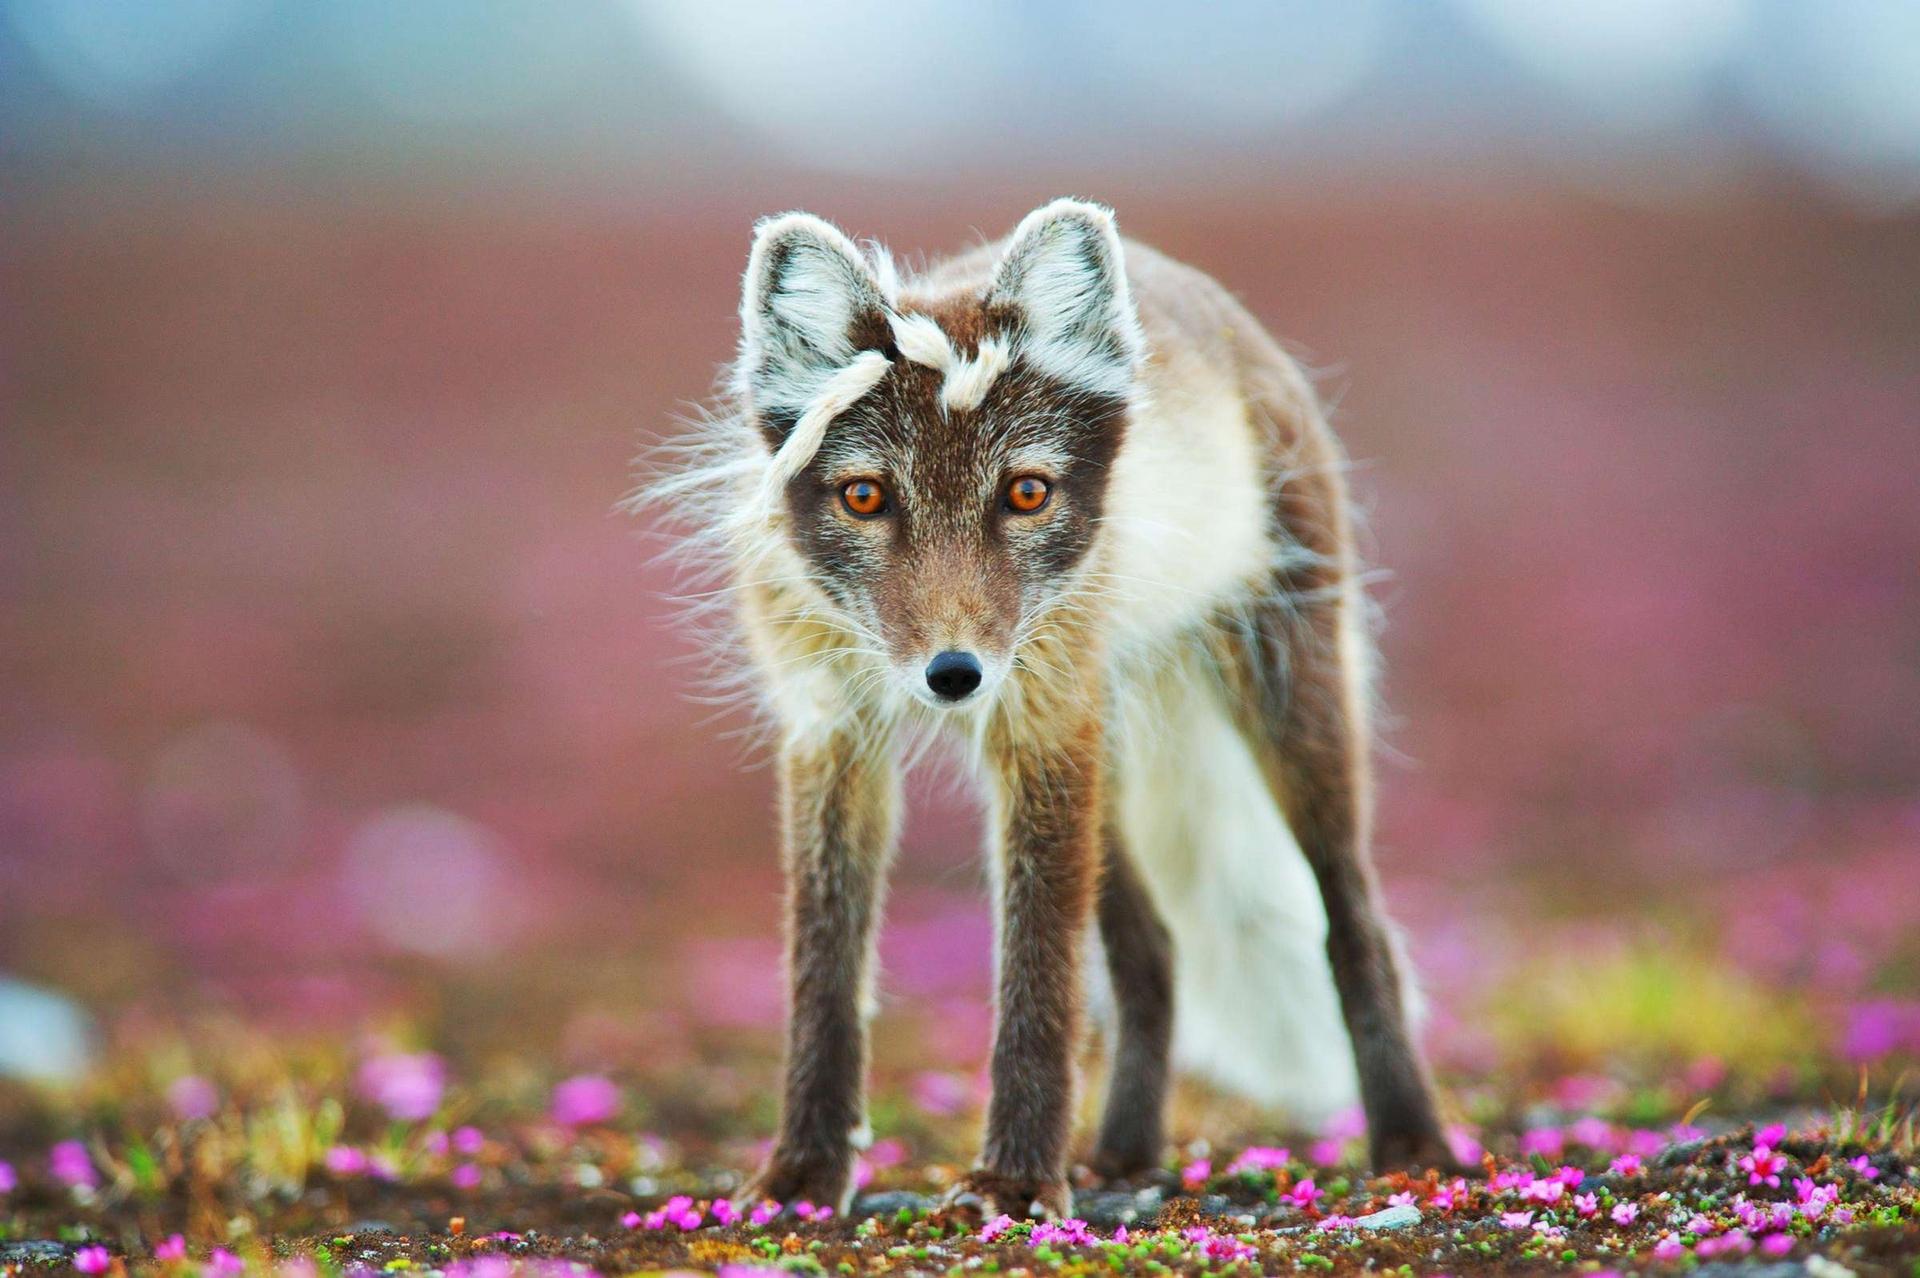 Photograph by Bjorn Anders Nymoen